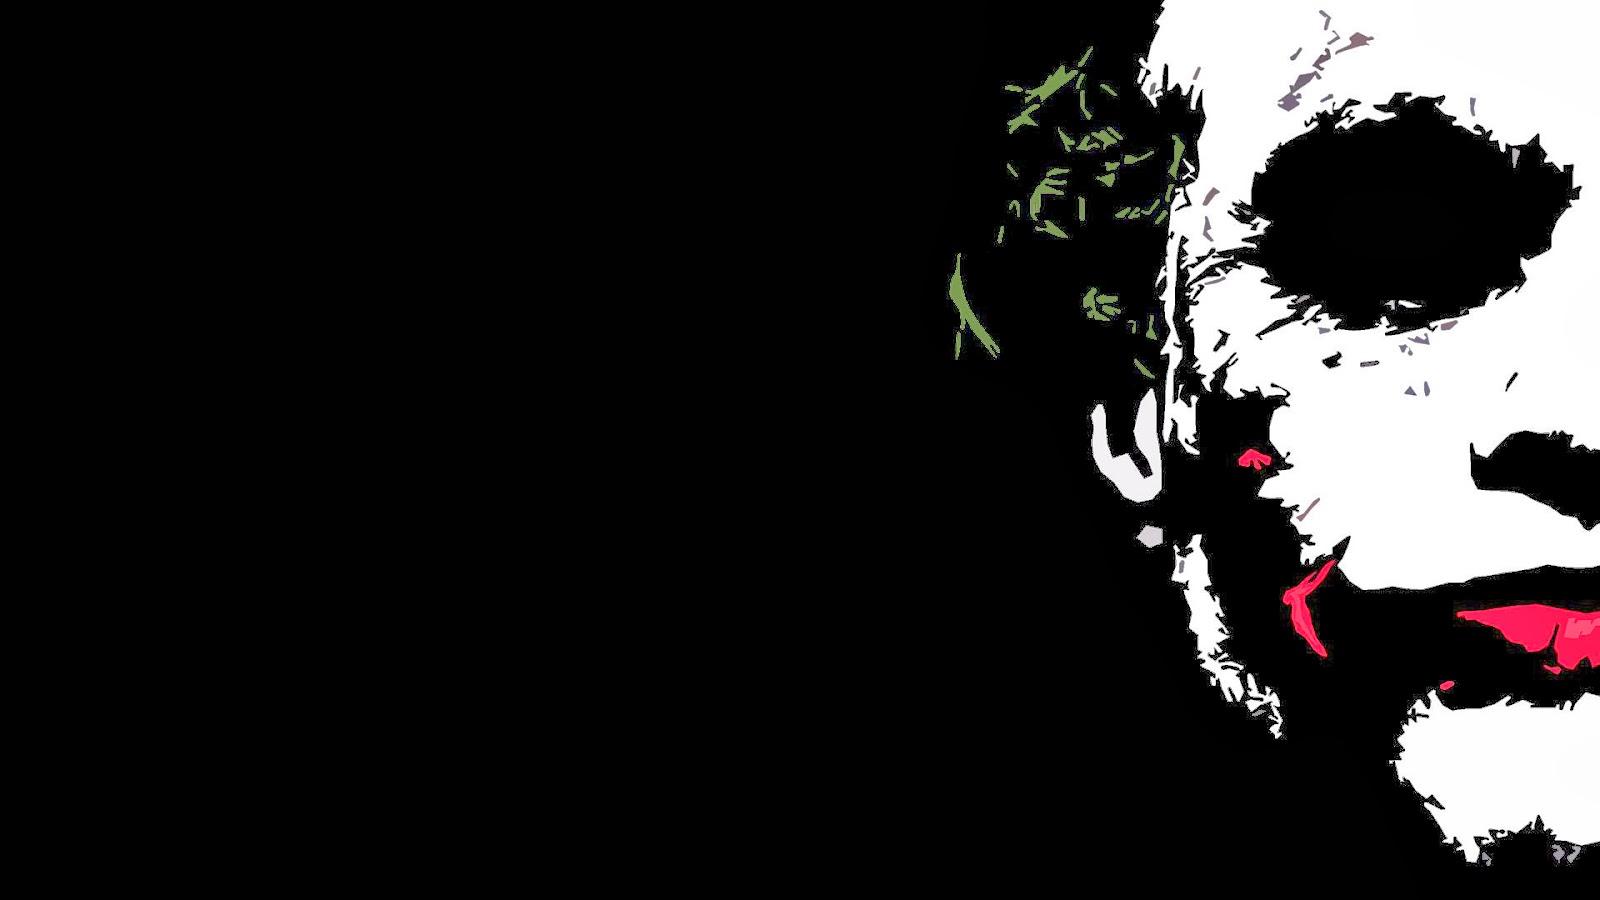 ✓ Sketsa Gambar Joker Kartun Hitam Putih